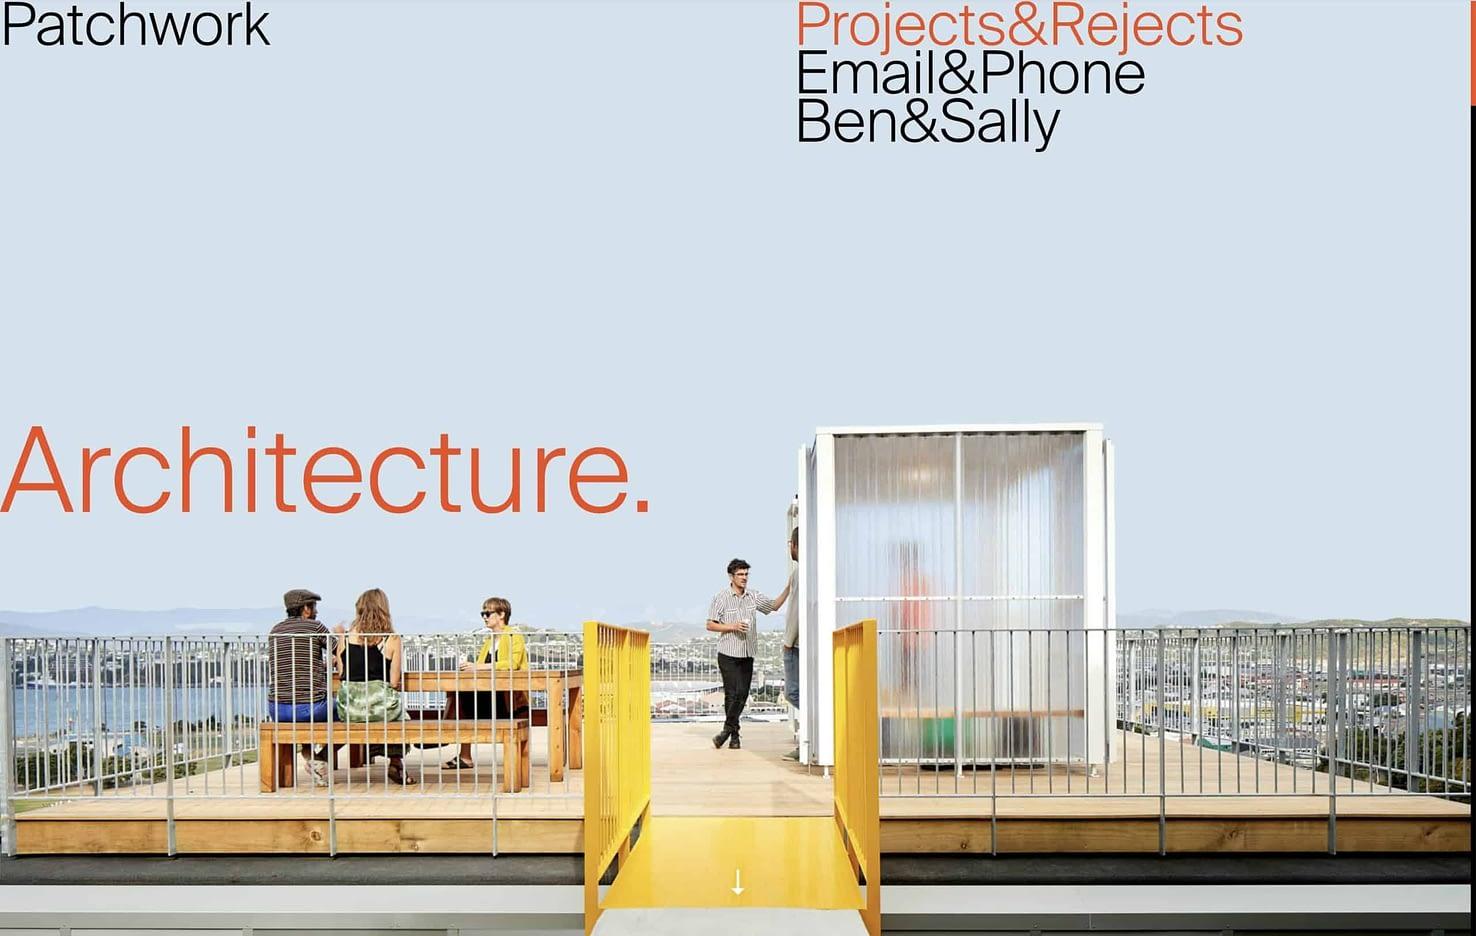 best architect website patchwork architecture